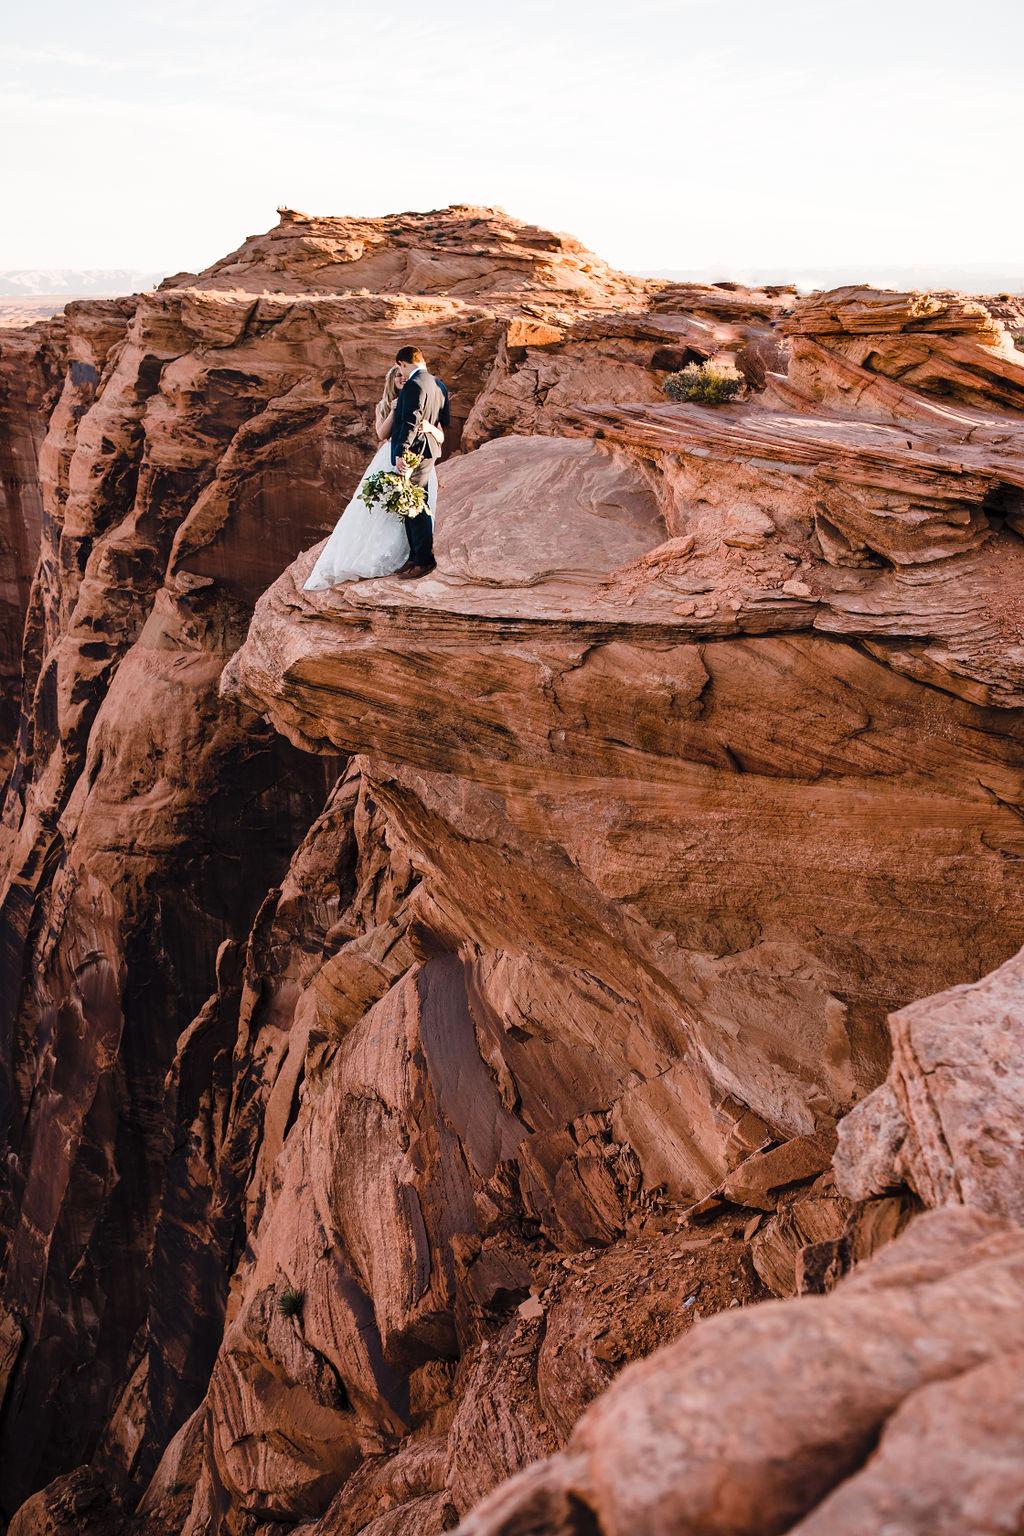 horseshoe bend formal photographer red rocks cliff white bouquet bohemian bride